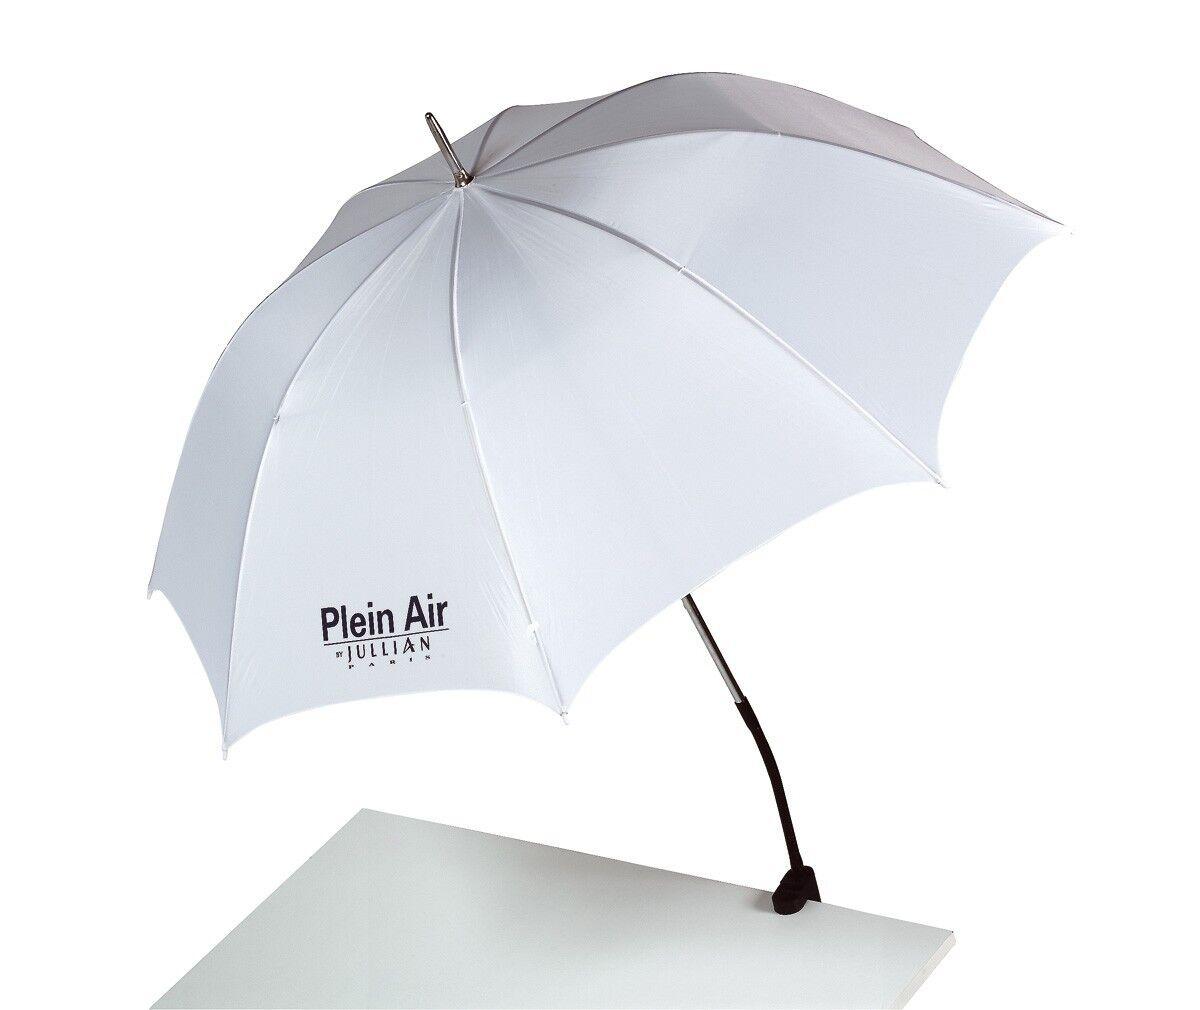 Jullian Plein Air Artist Umbrella Attachment For Field